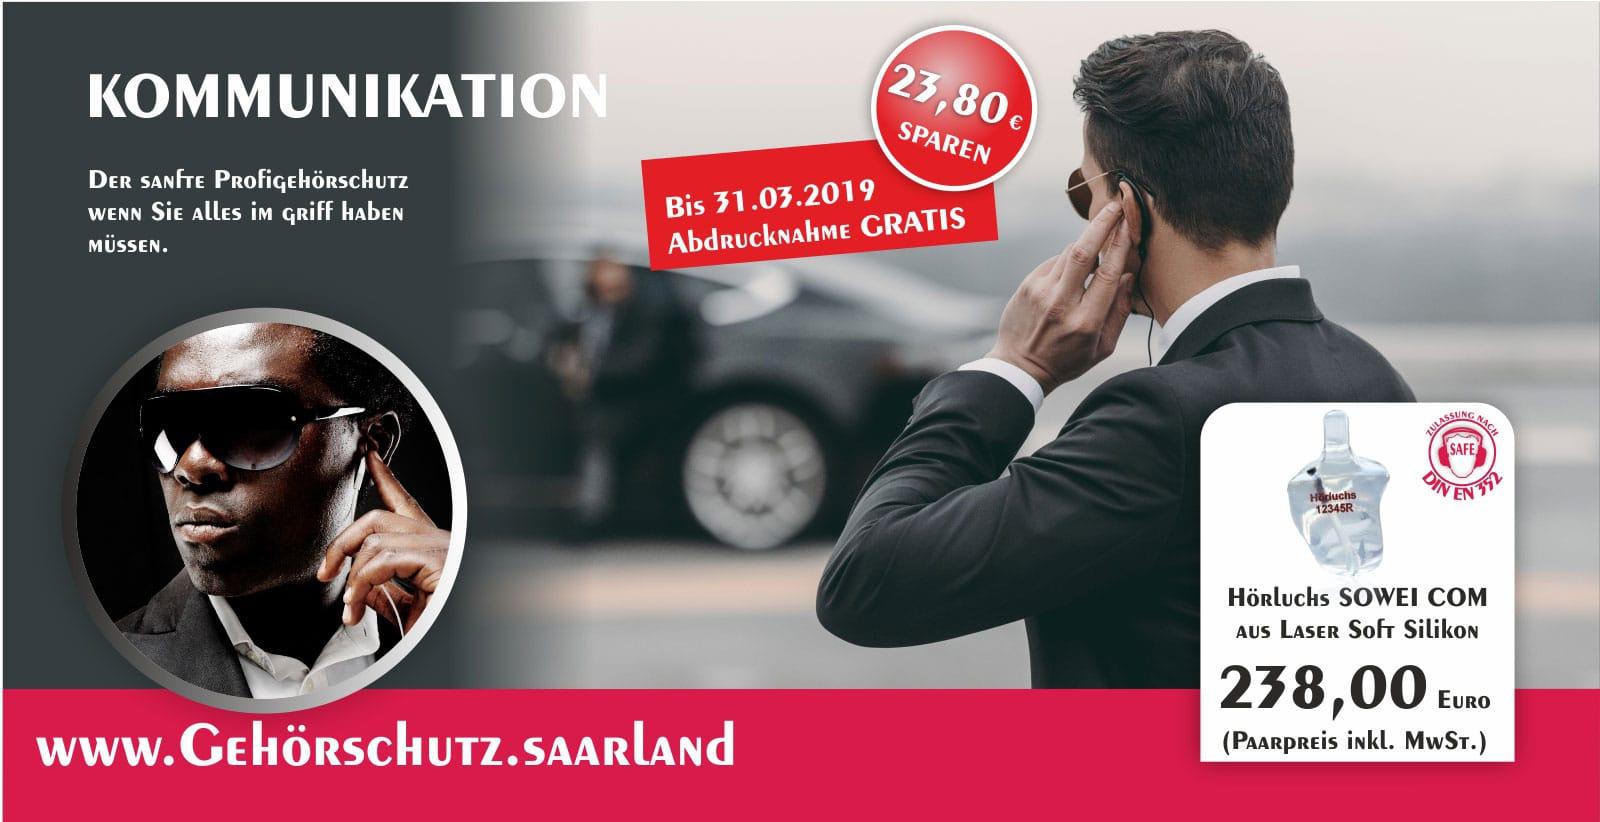 Gisbrecht Hörakustik - Gehörschutz Partner Hörluchs - SOWEI COM Aktion - Gehörschutz für Kommunikation